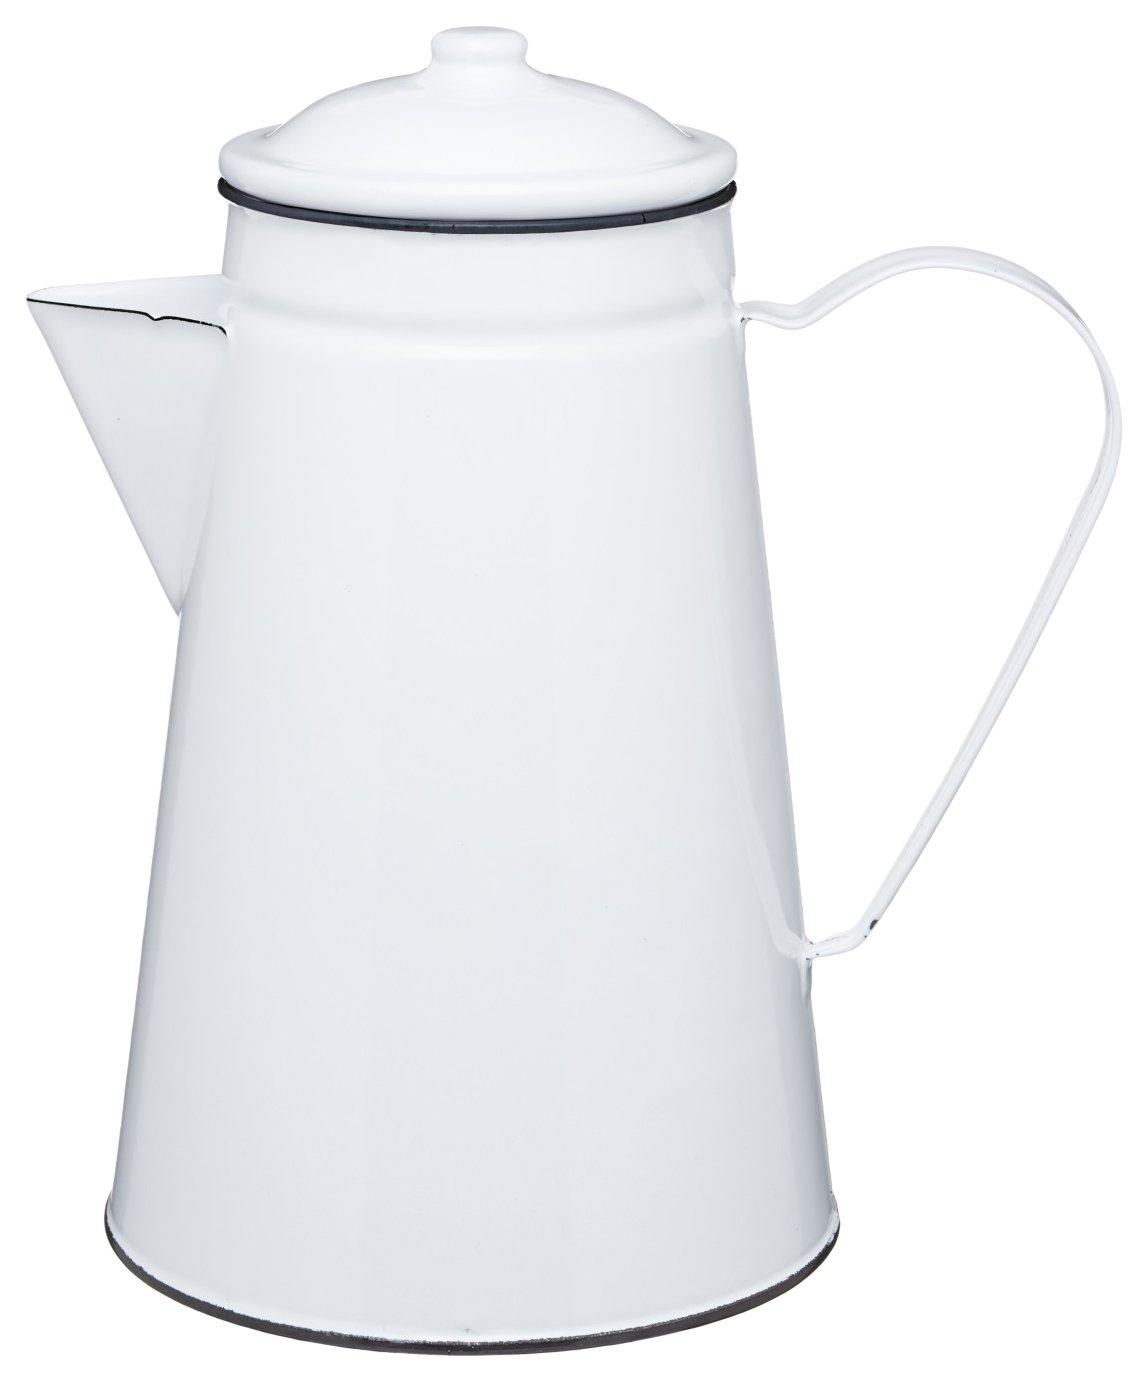 KitchenCraft Living Nostalgia Enamel Coffee Pot / Serving Jug / Vase, 1.5 L (2.5 pts) – White / Grey Kitchen Craft LNENCOFJUG